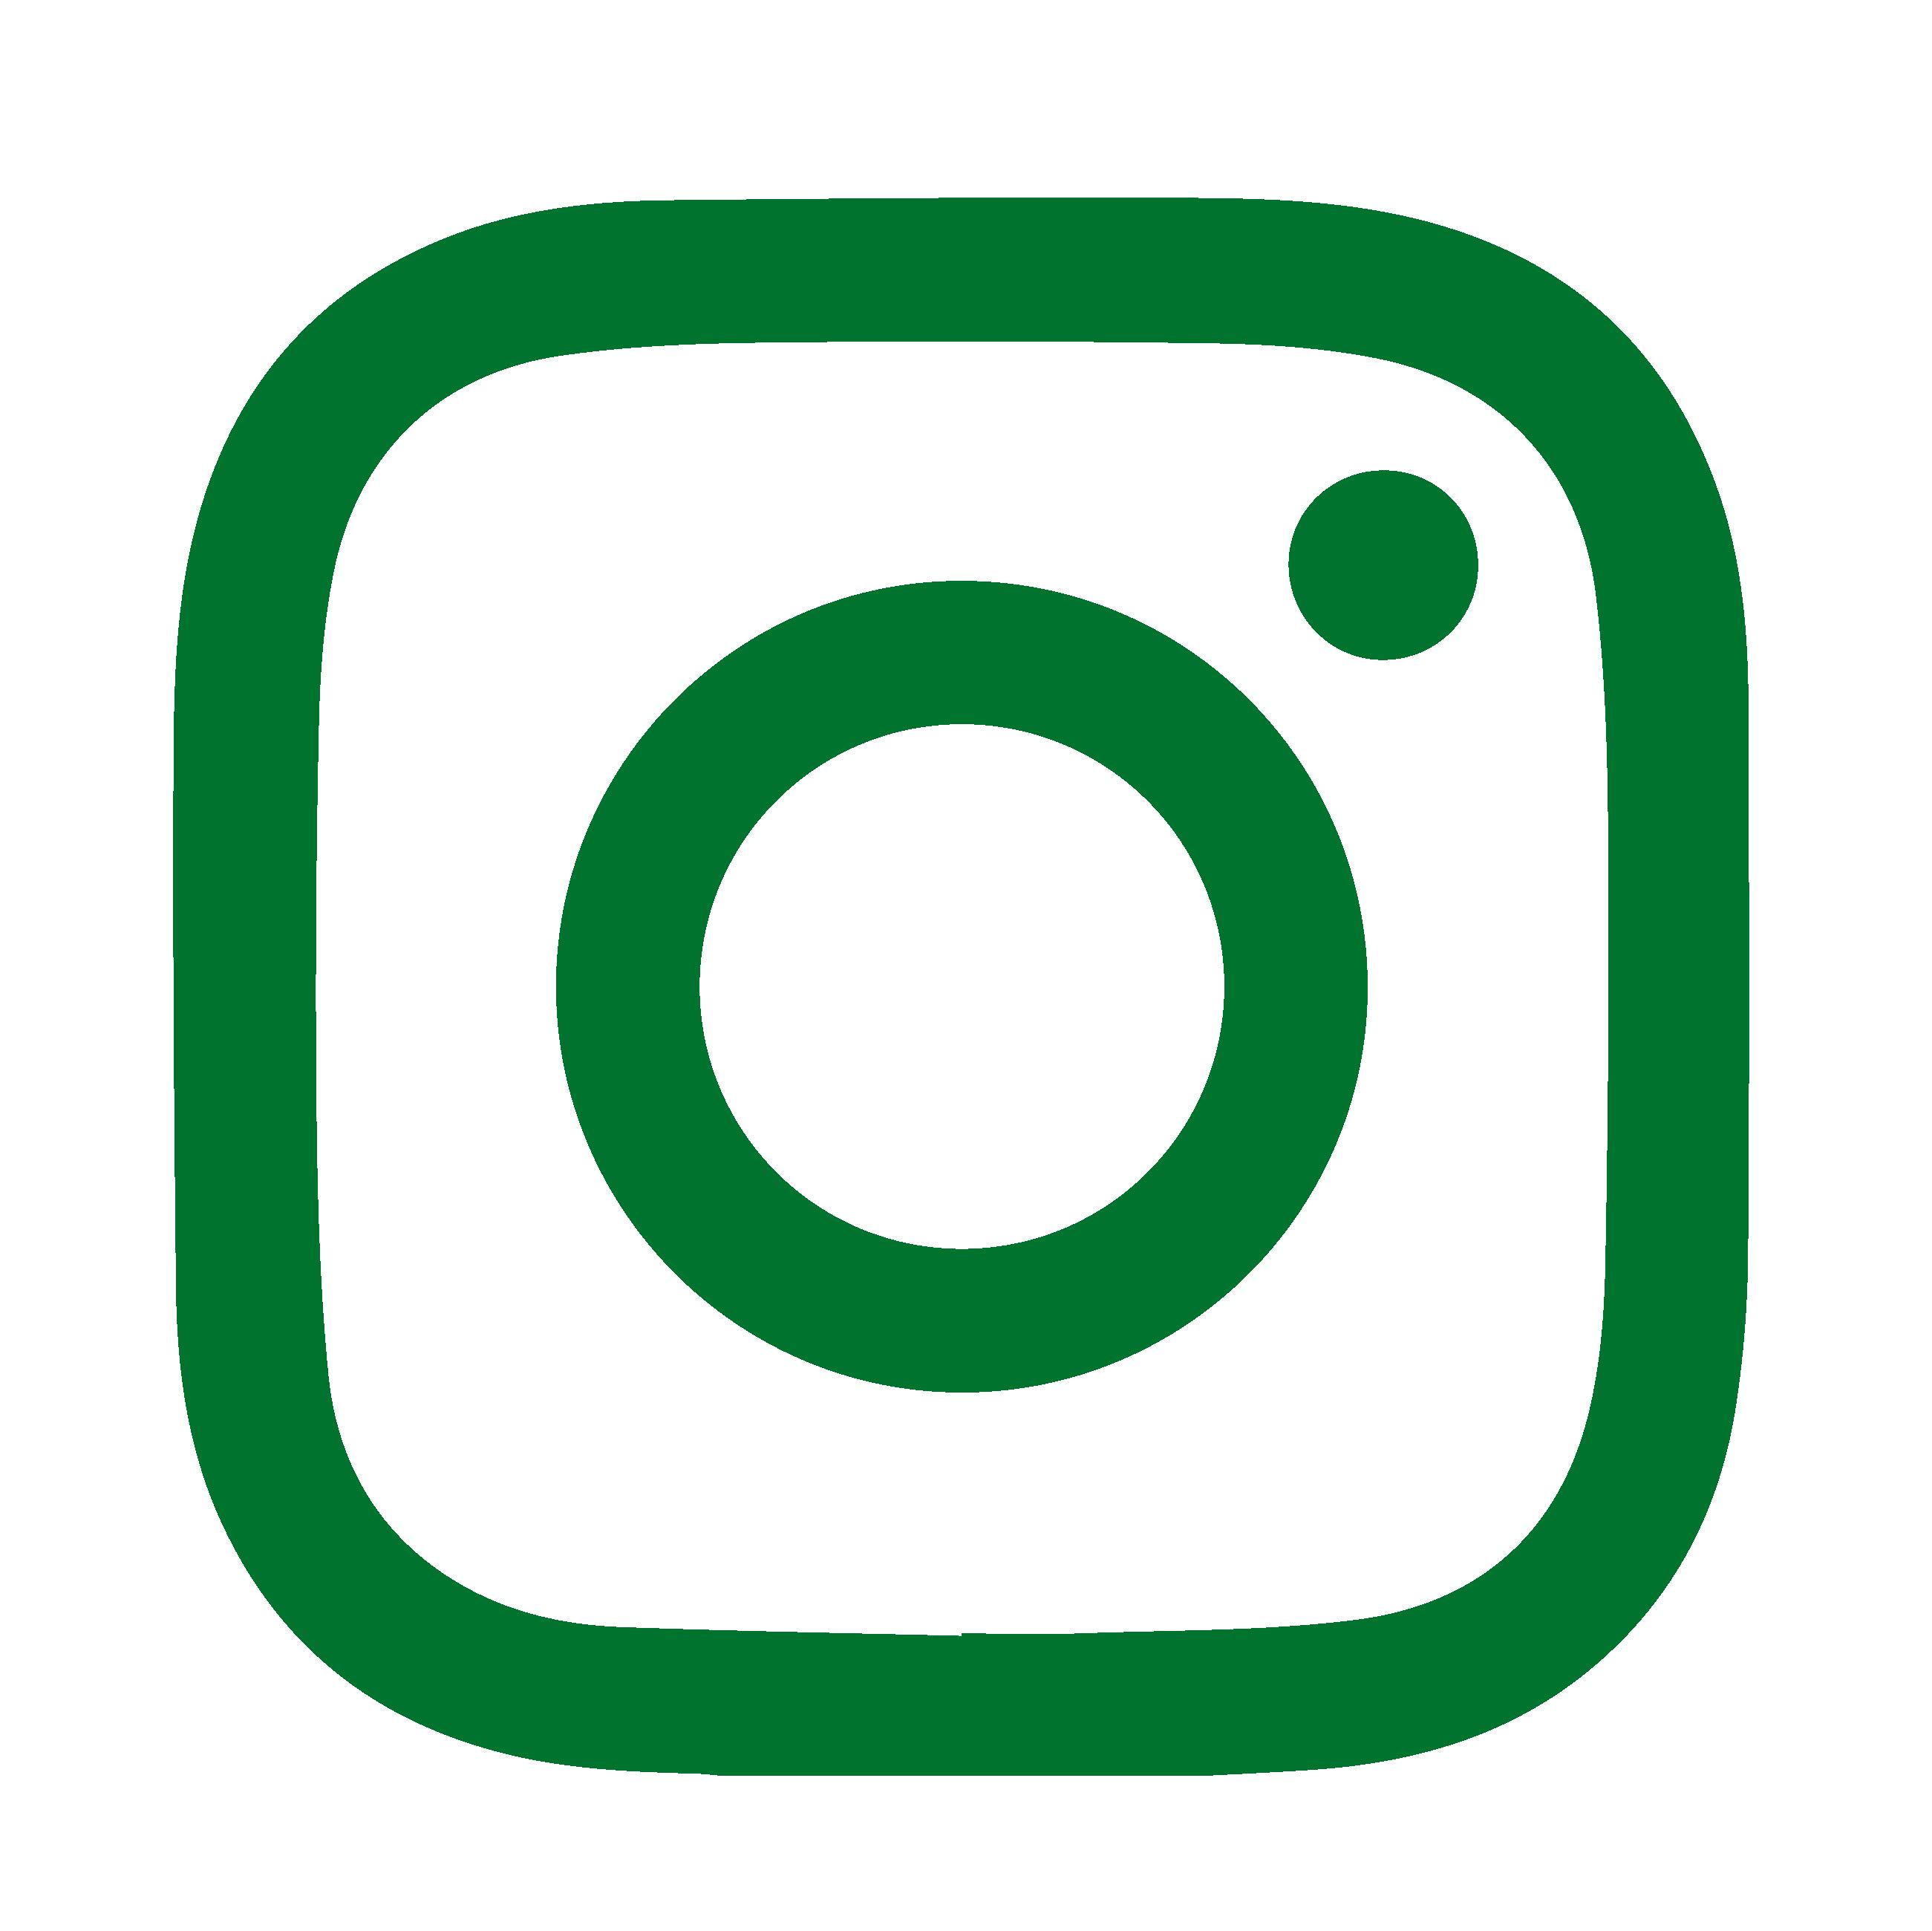 Green Instagram logo